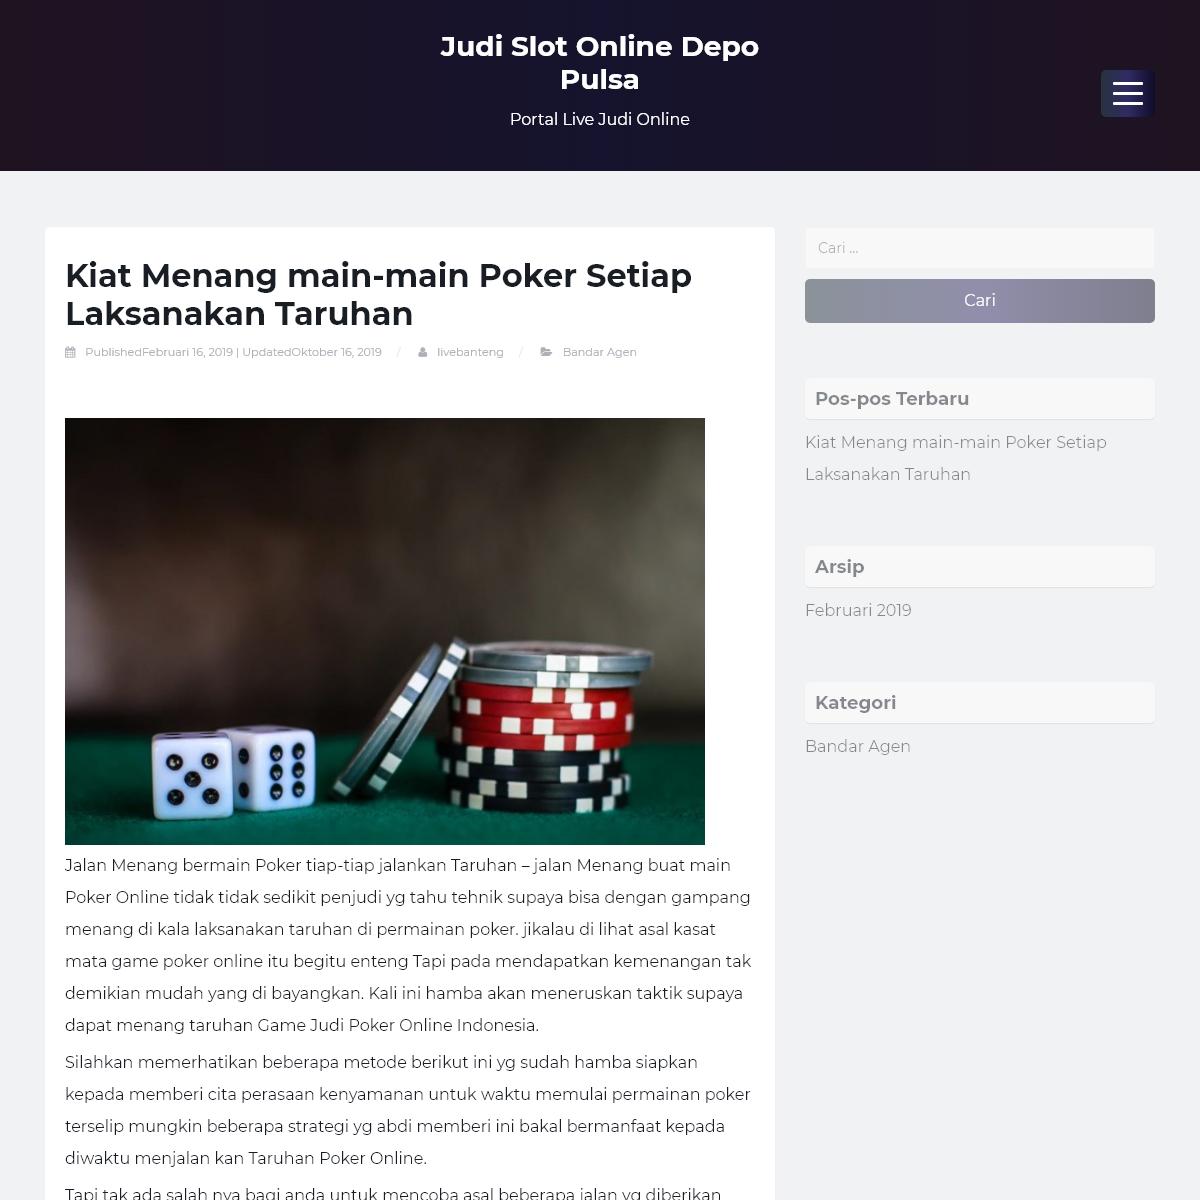 Judi Slot Online Depo Pulsa - Portal Live Judi Online